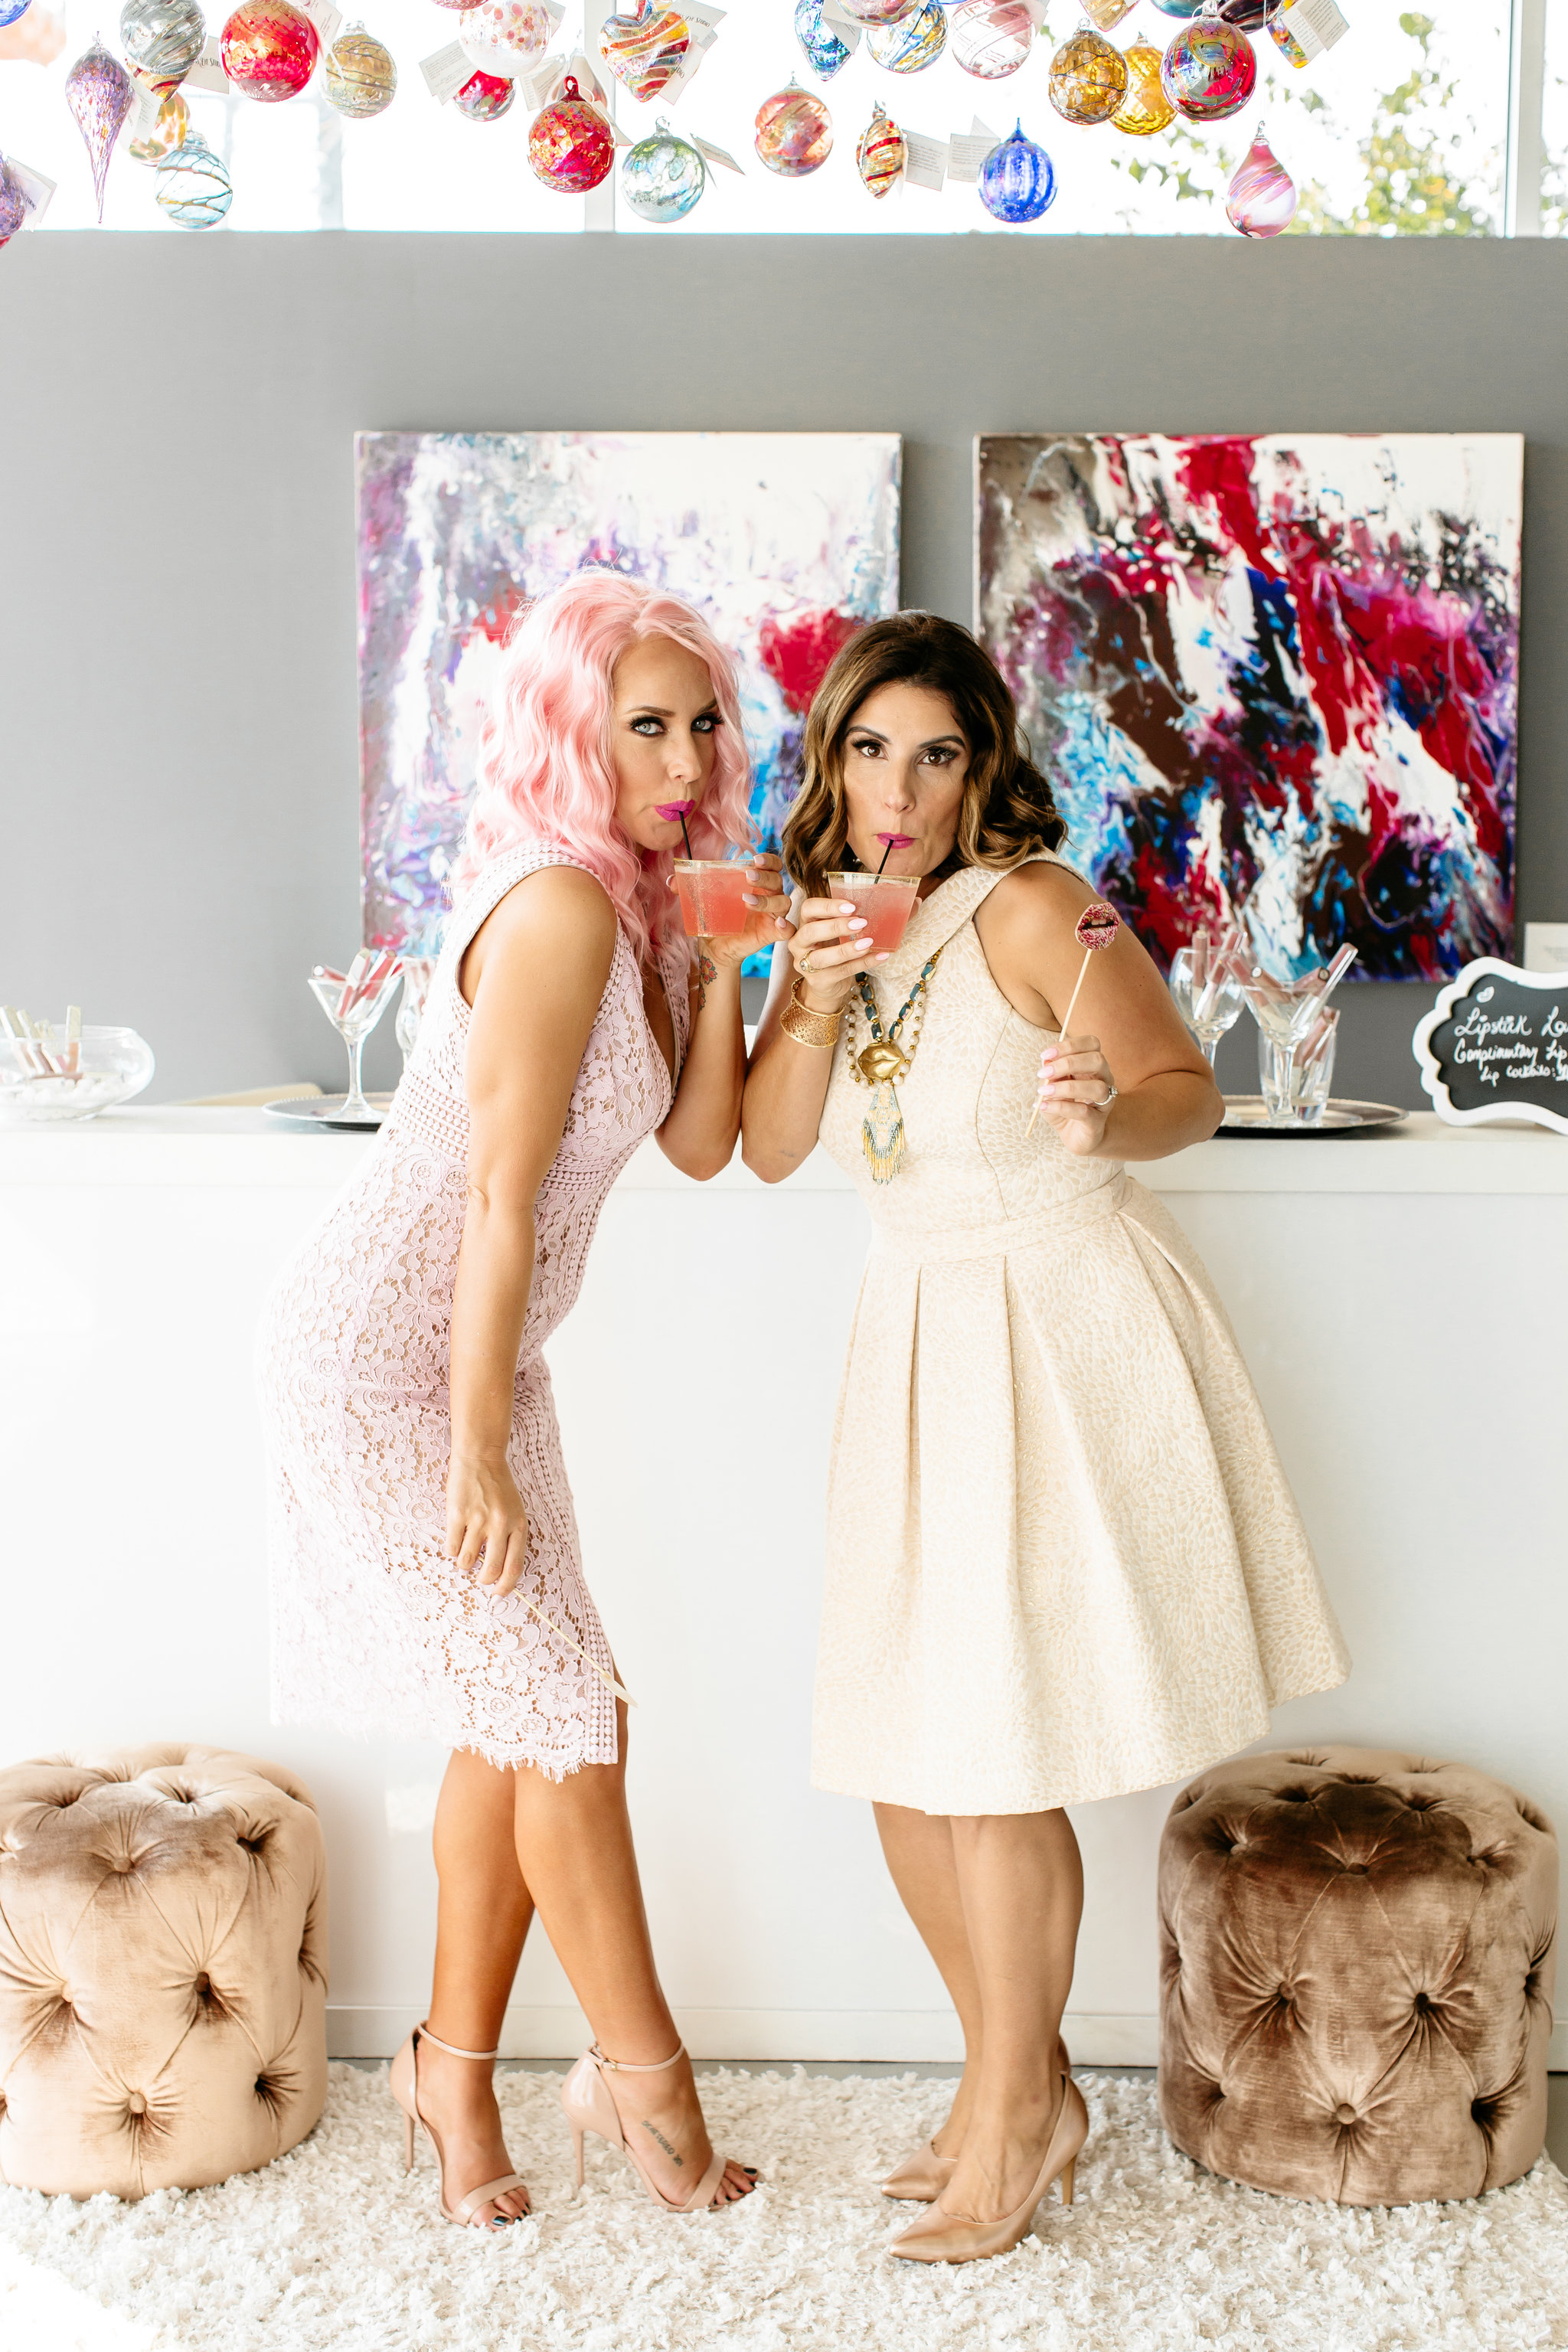 Alexa-Vossler-Photo_Dallas-Event-Photographer_Brite-Bar-Beauty-2018-Lipstick-Launch-Party-39.jpg